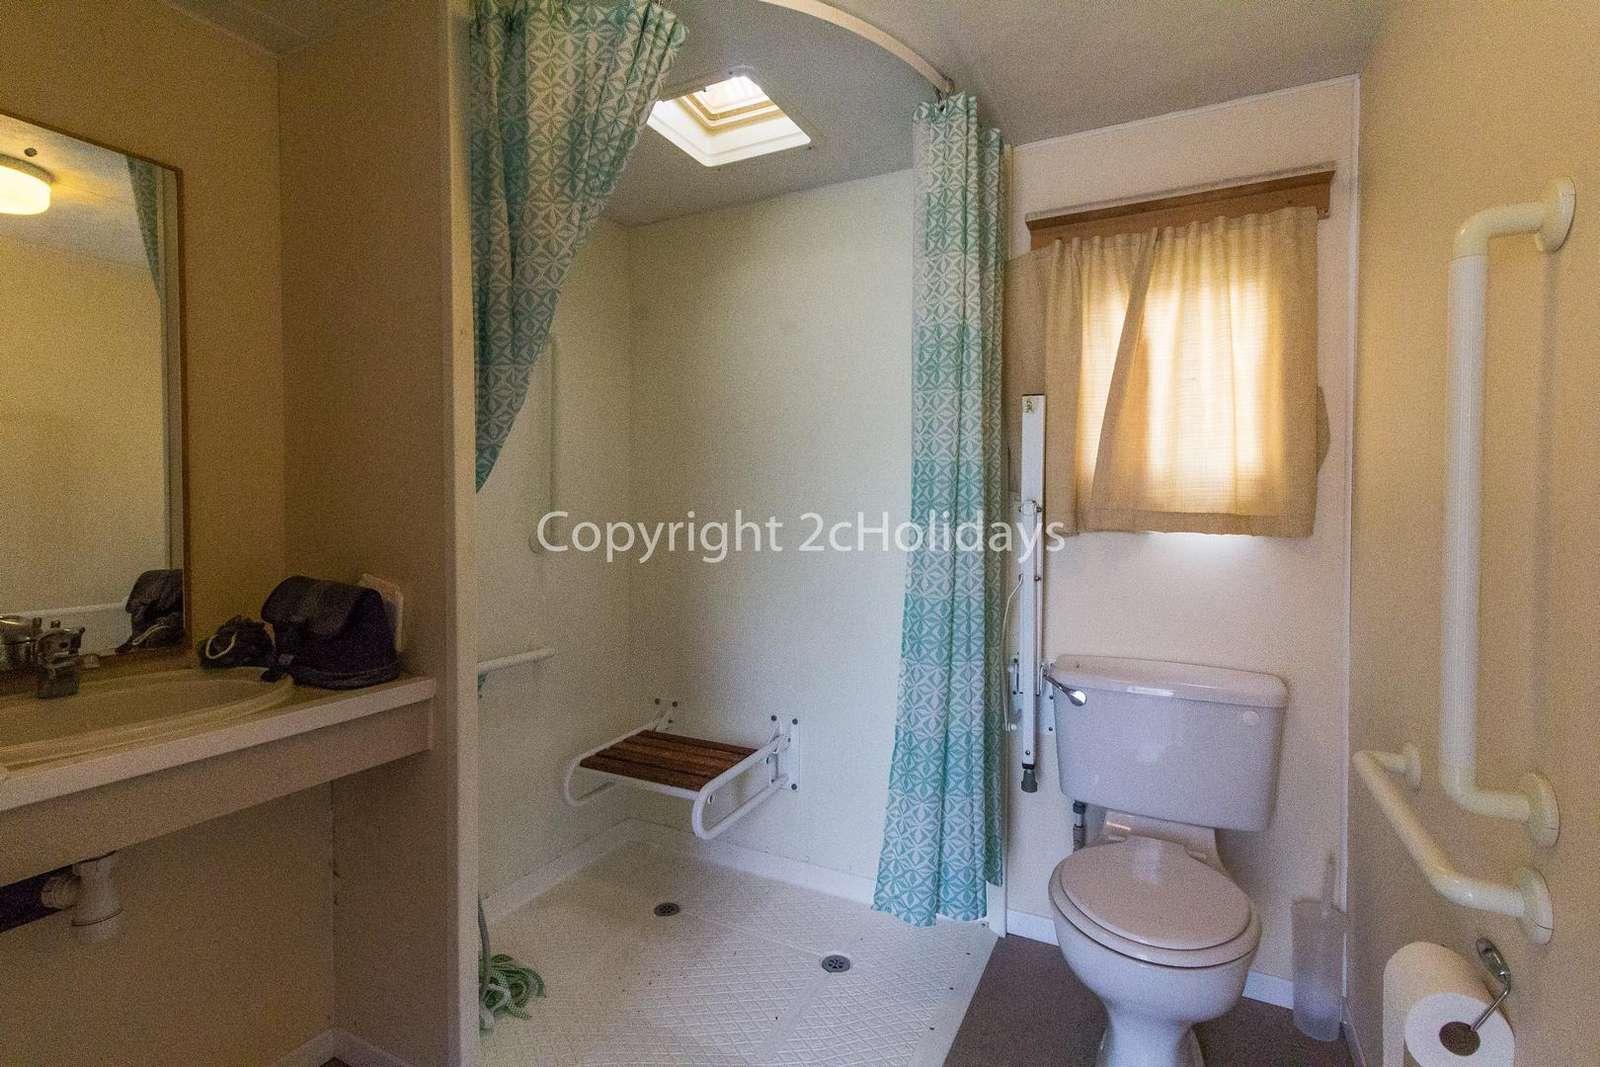 Spacious wheel chair adapted wet room